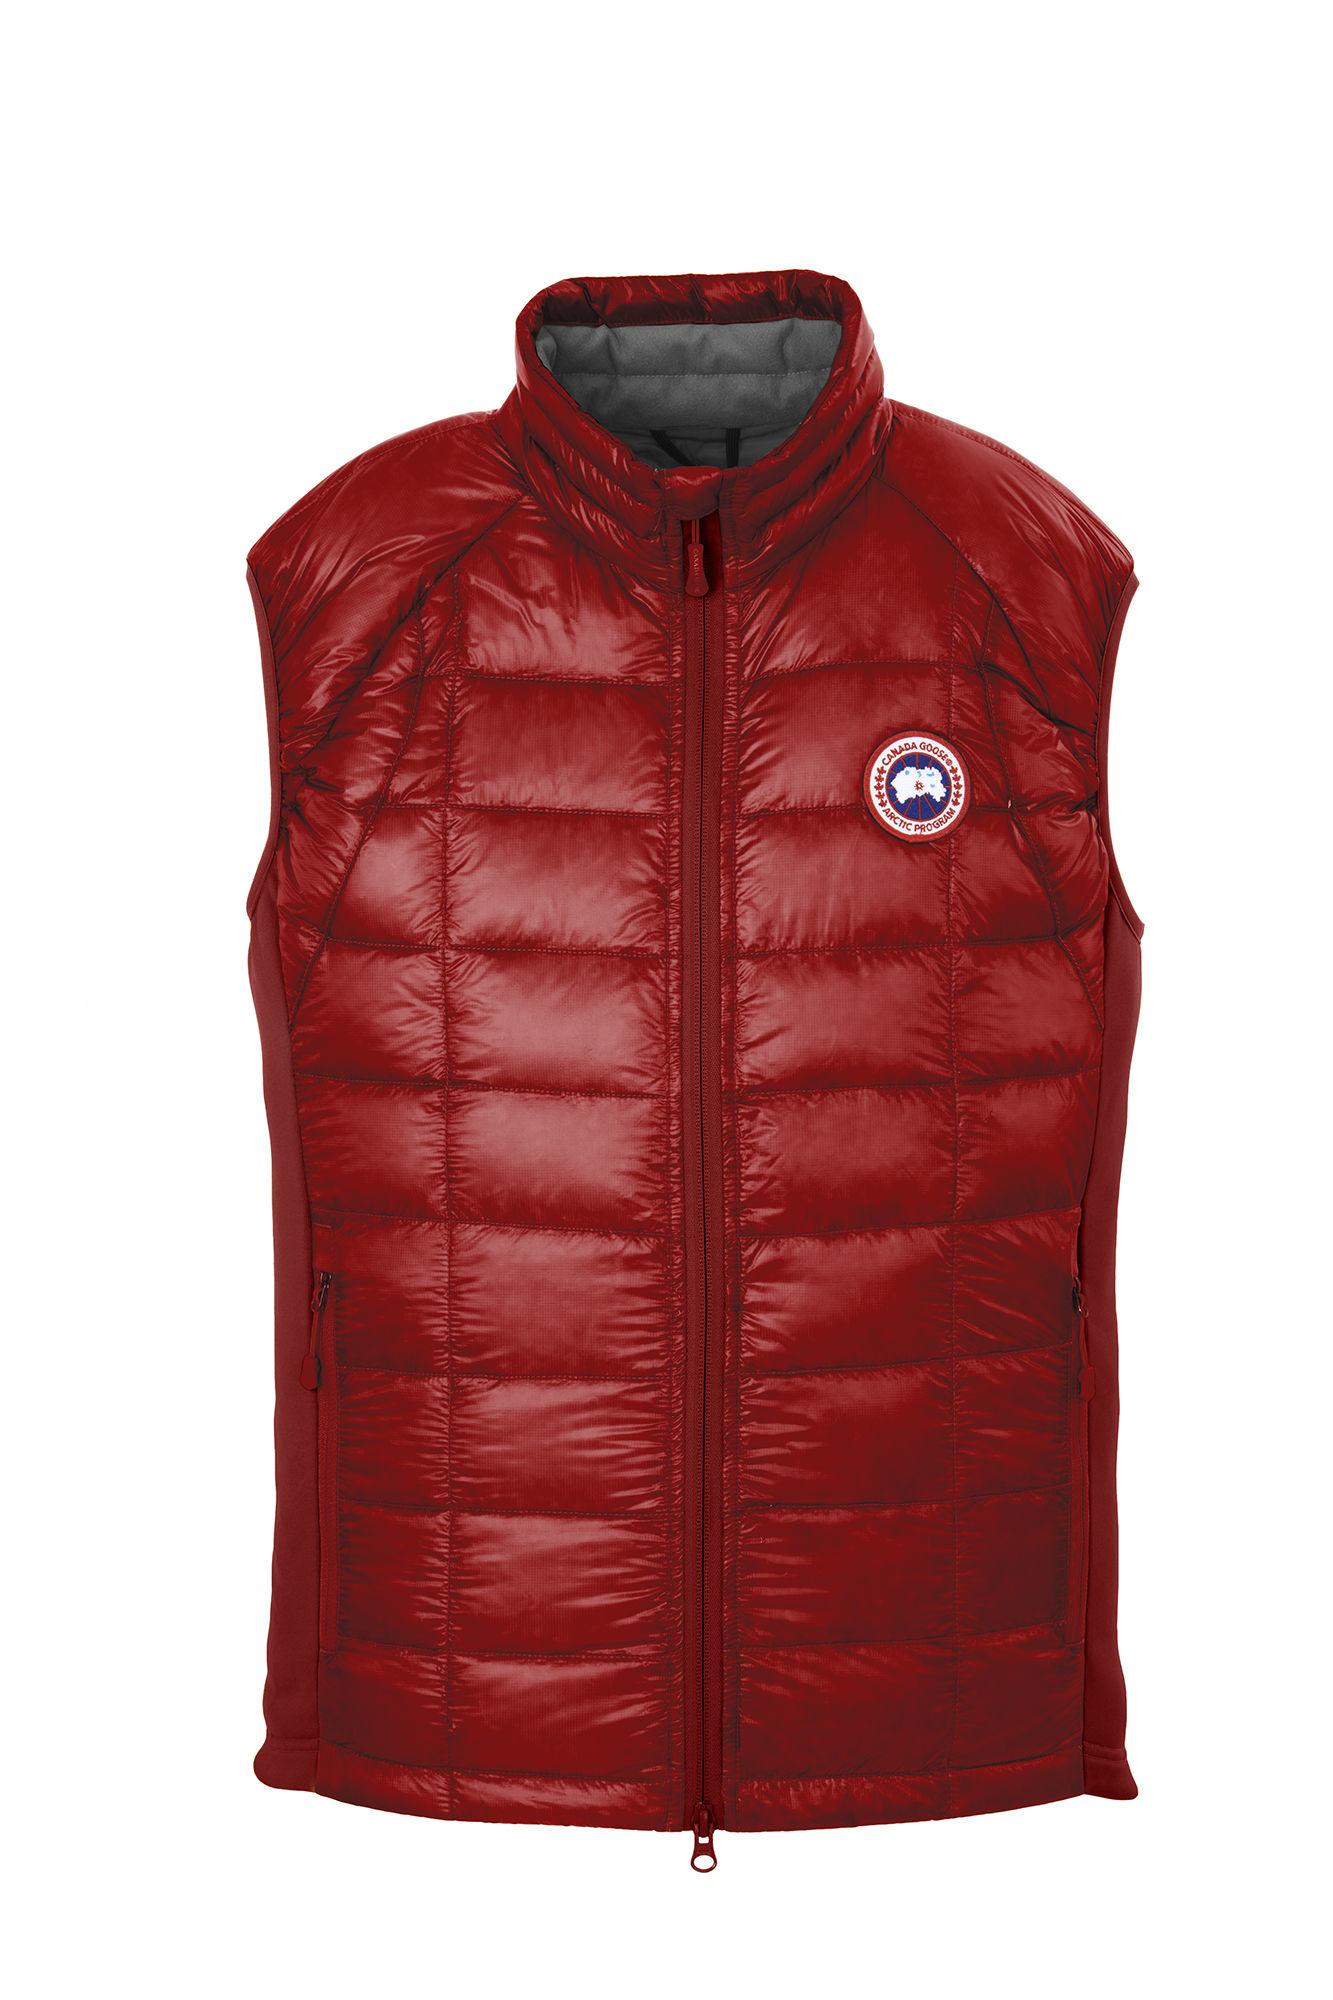 Canada Goose' Hybridge Lite Vest - Men's Small - Black / Red